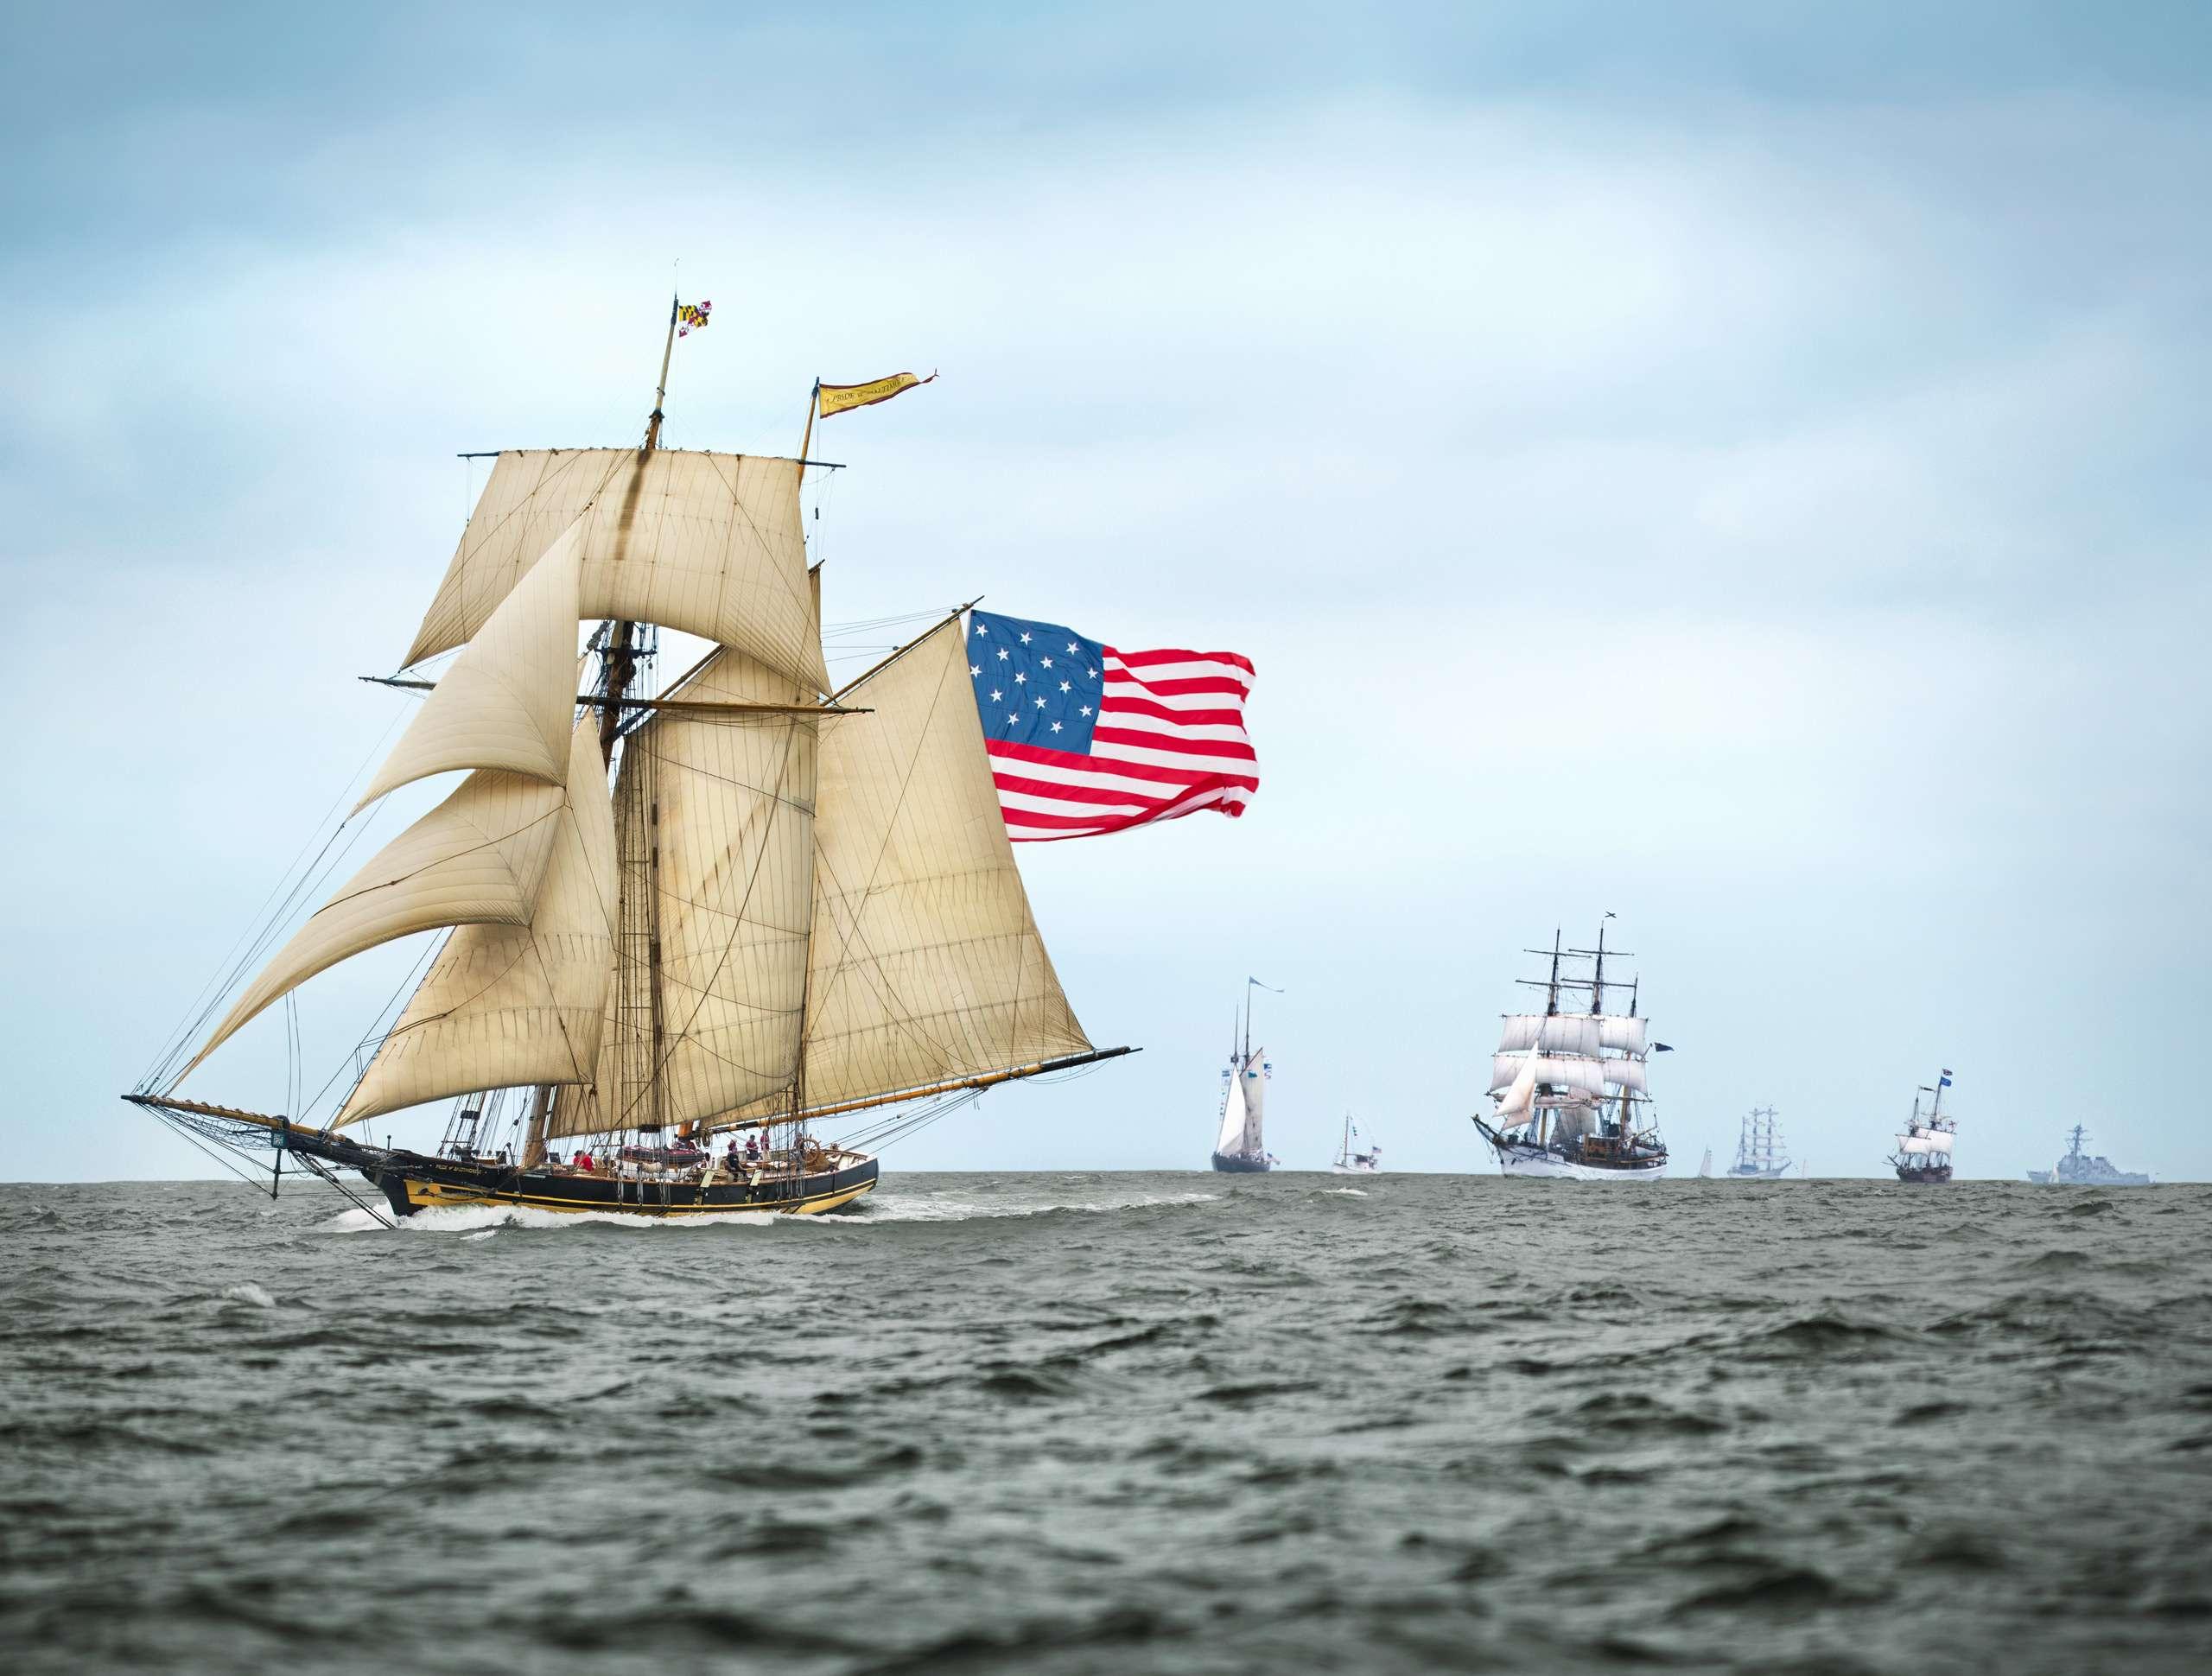 PORTFOLIO - Sailing - Windjammers  #1 - PCG687